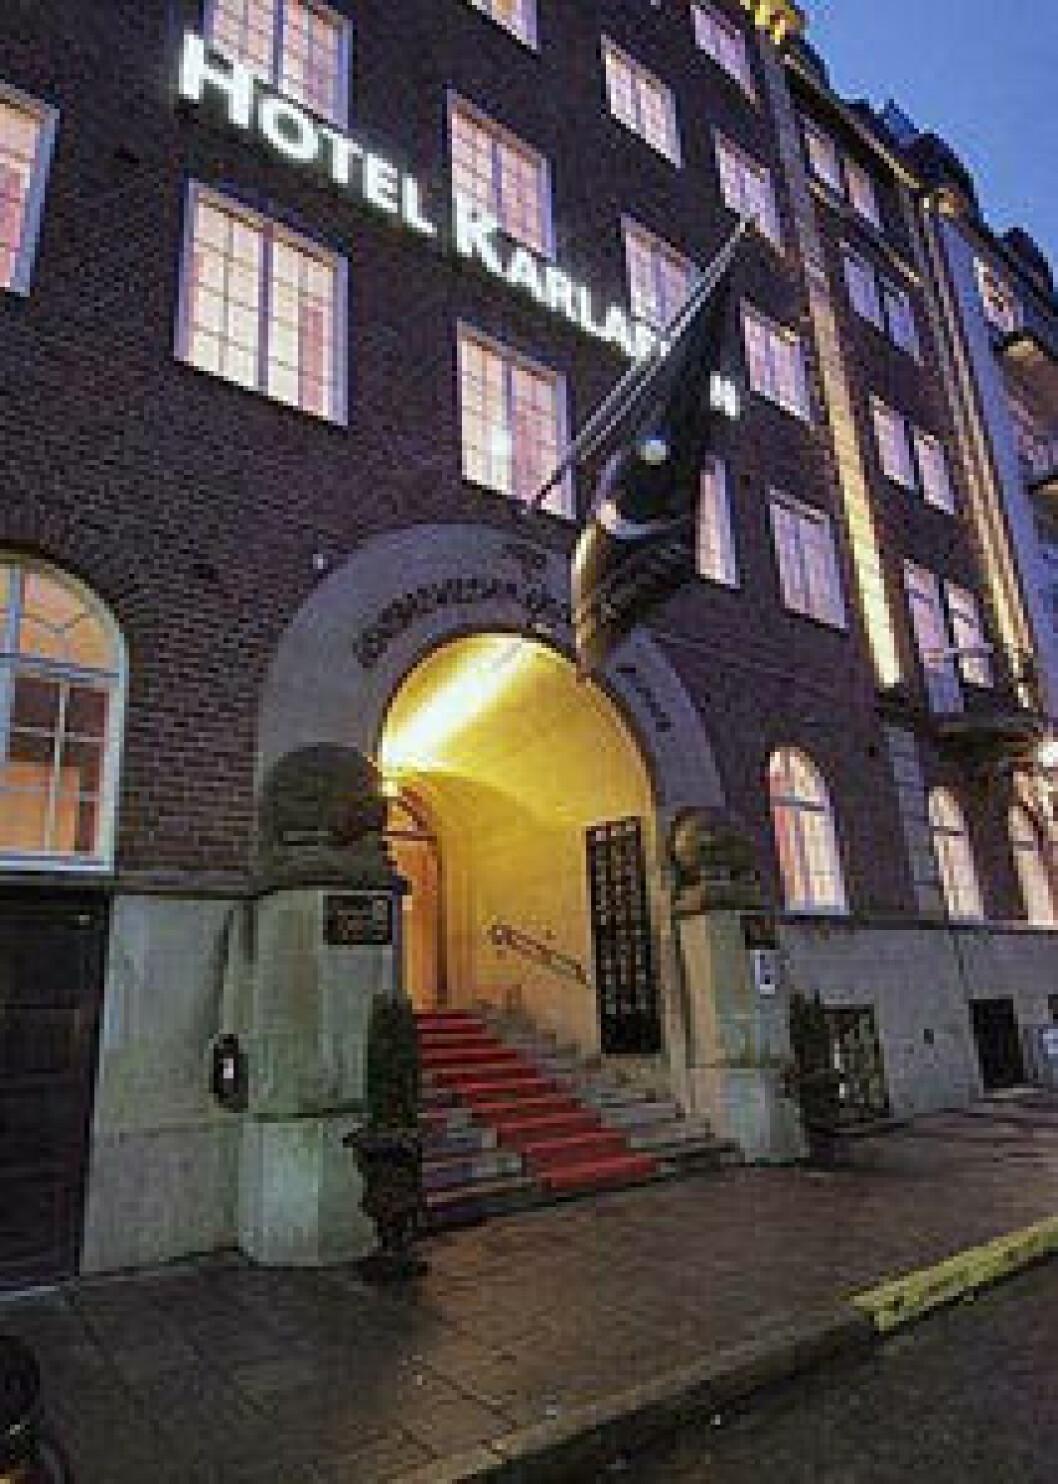 Hotel Karlaplan2